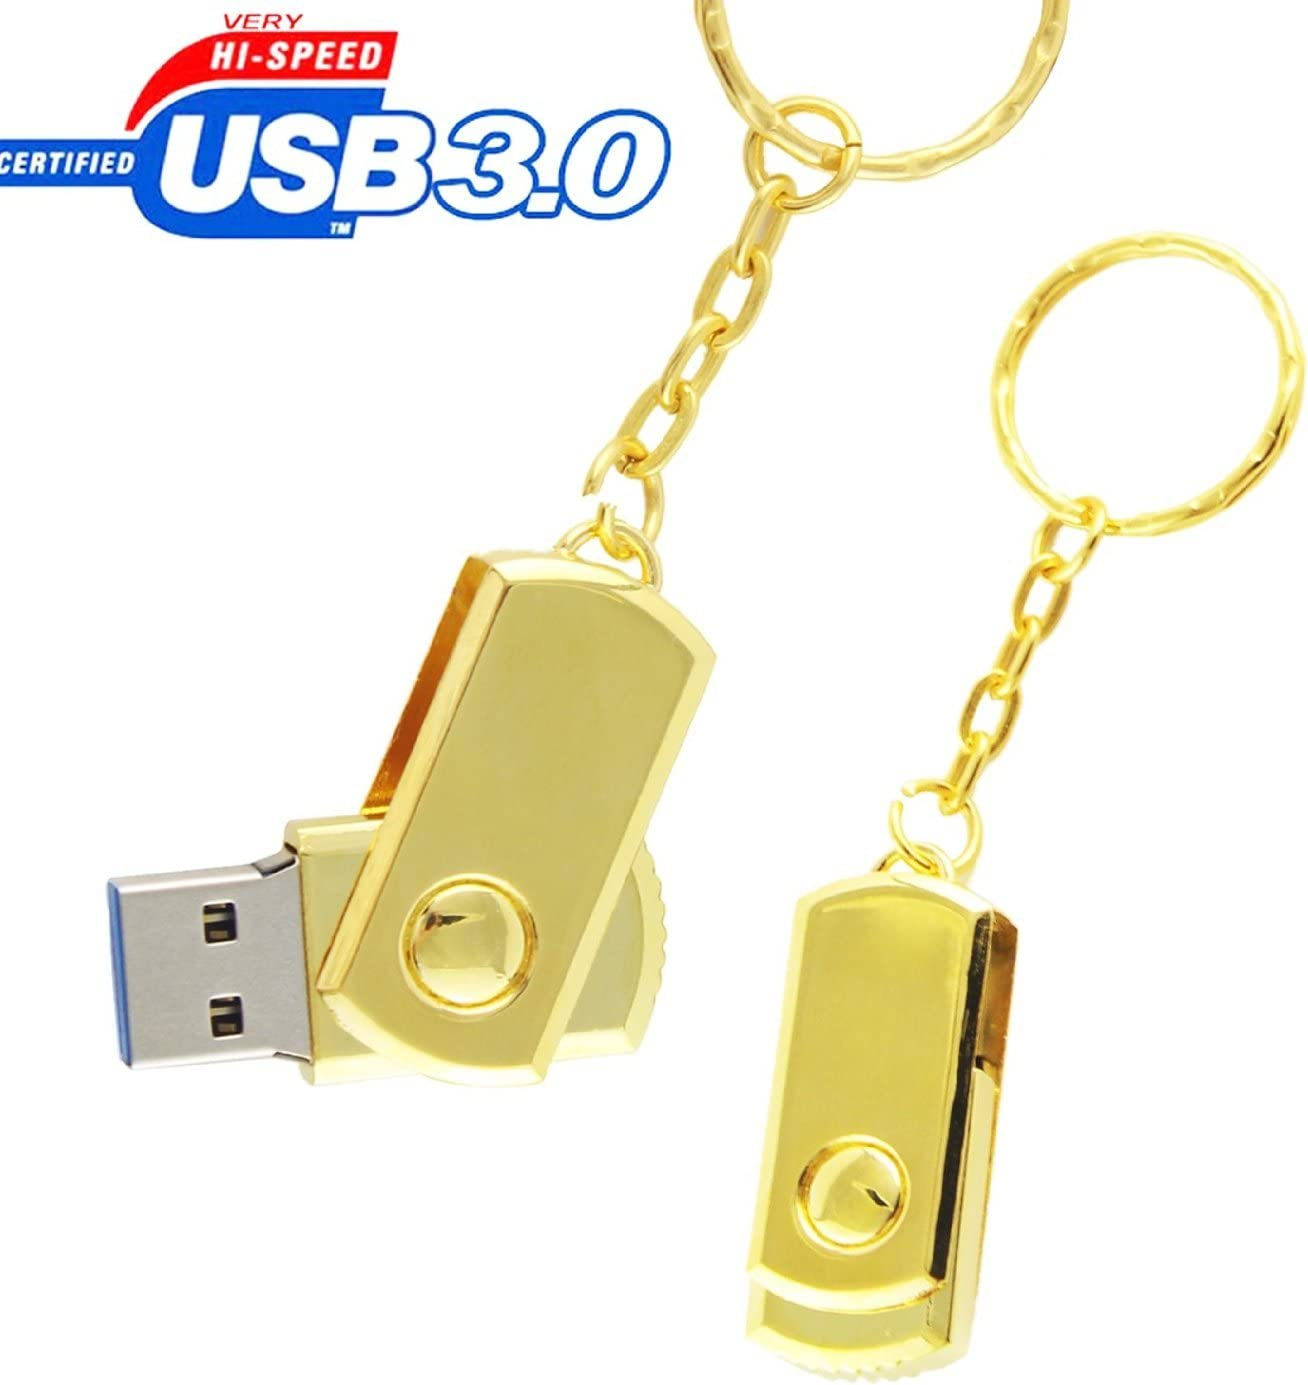 YC 3.0 USB Metal Thin Key Flash Memory Stick Pen Drive (32GB, 3 Pack Metal)